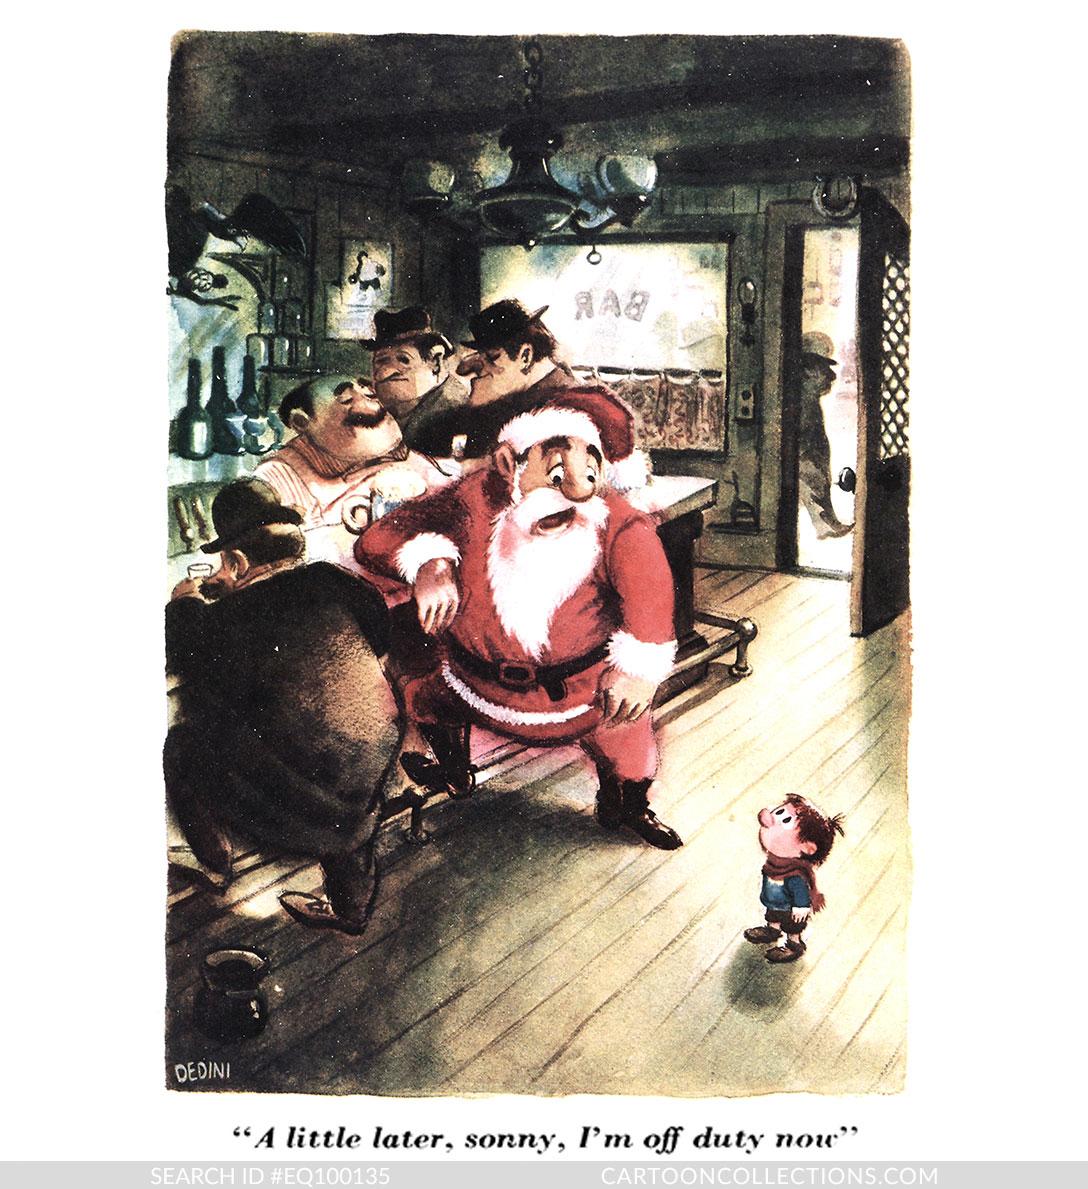 CartoonCollections.com - Bad Santa cartoons - Eldon Dedini